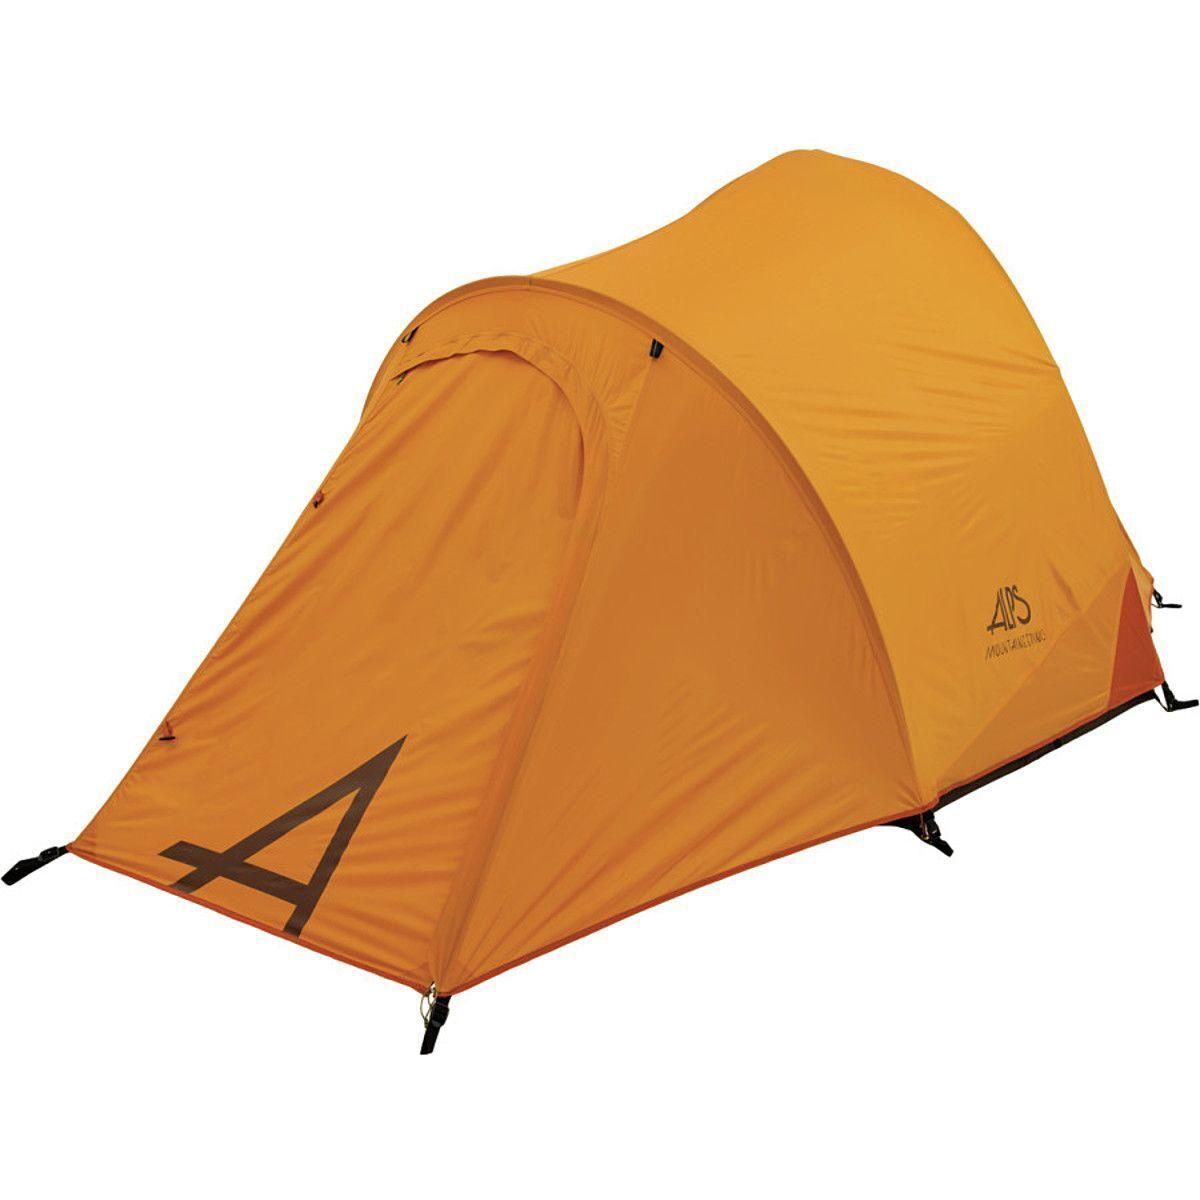 ALPS Mountaineering Tasmanian 3 Tent: 3-Person 4-Season Copper/Rust, One Size